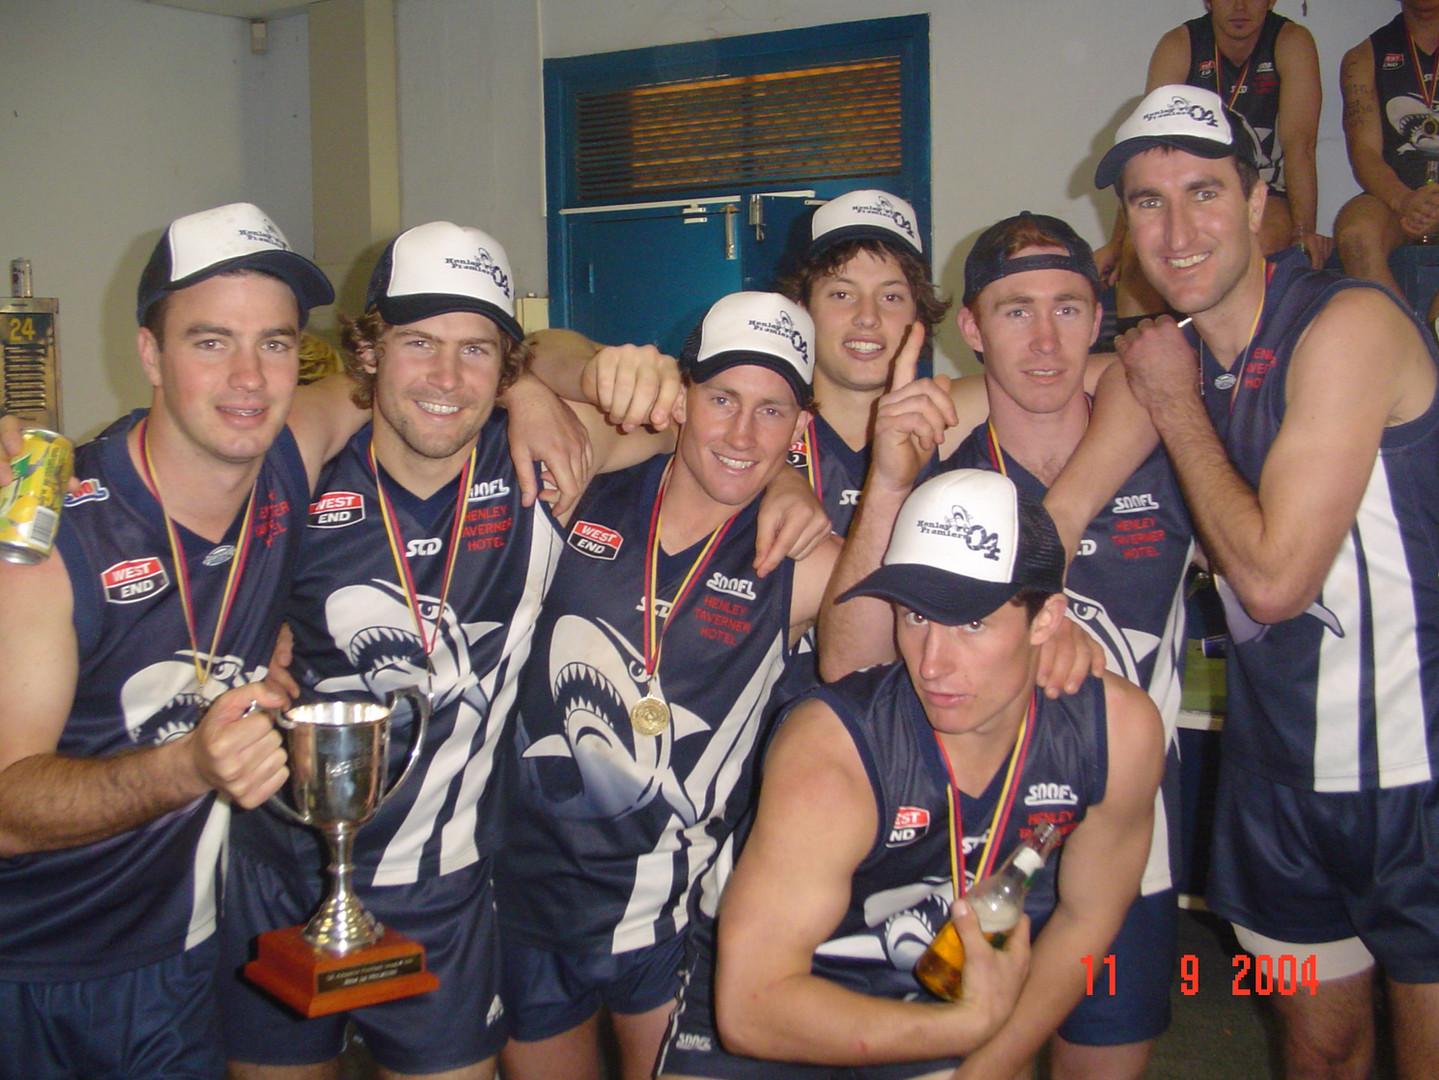 2004 Senior Men GF 0014.jpeg